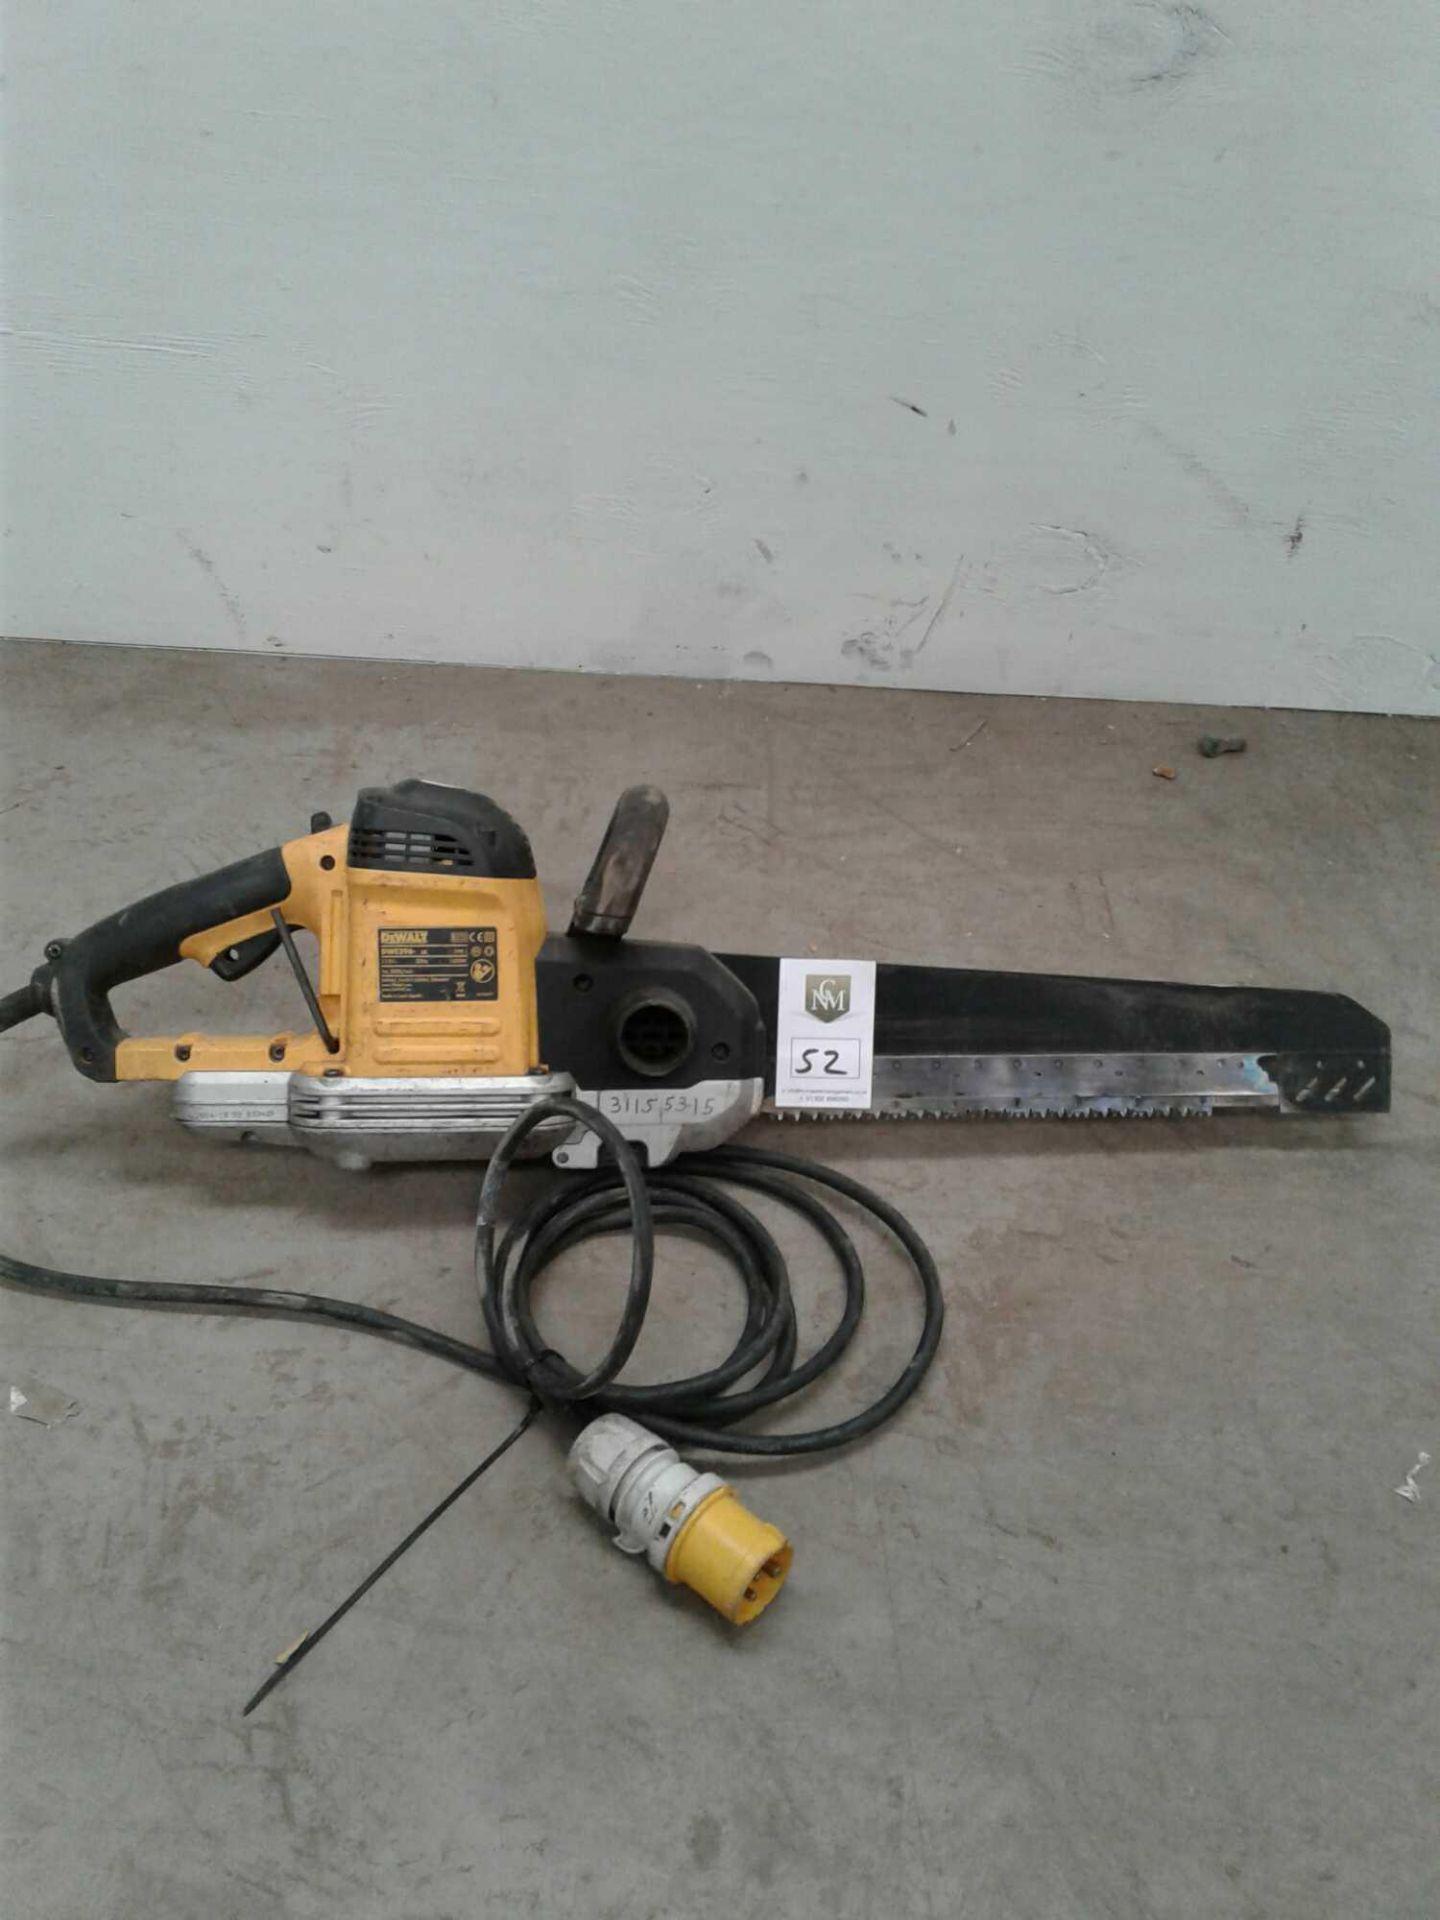 Lot 52 - DeWalt wood saw 110 V